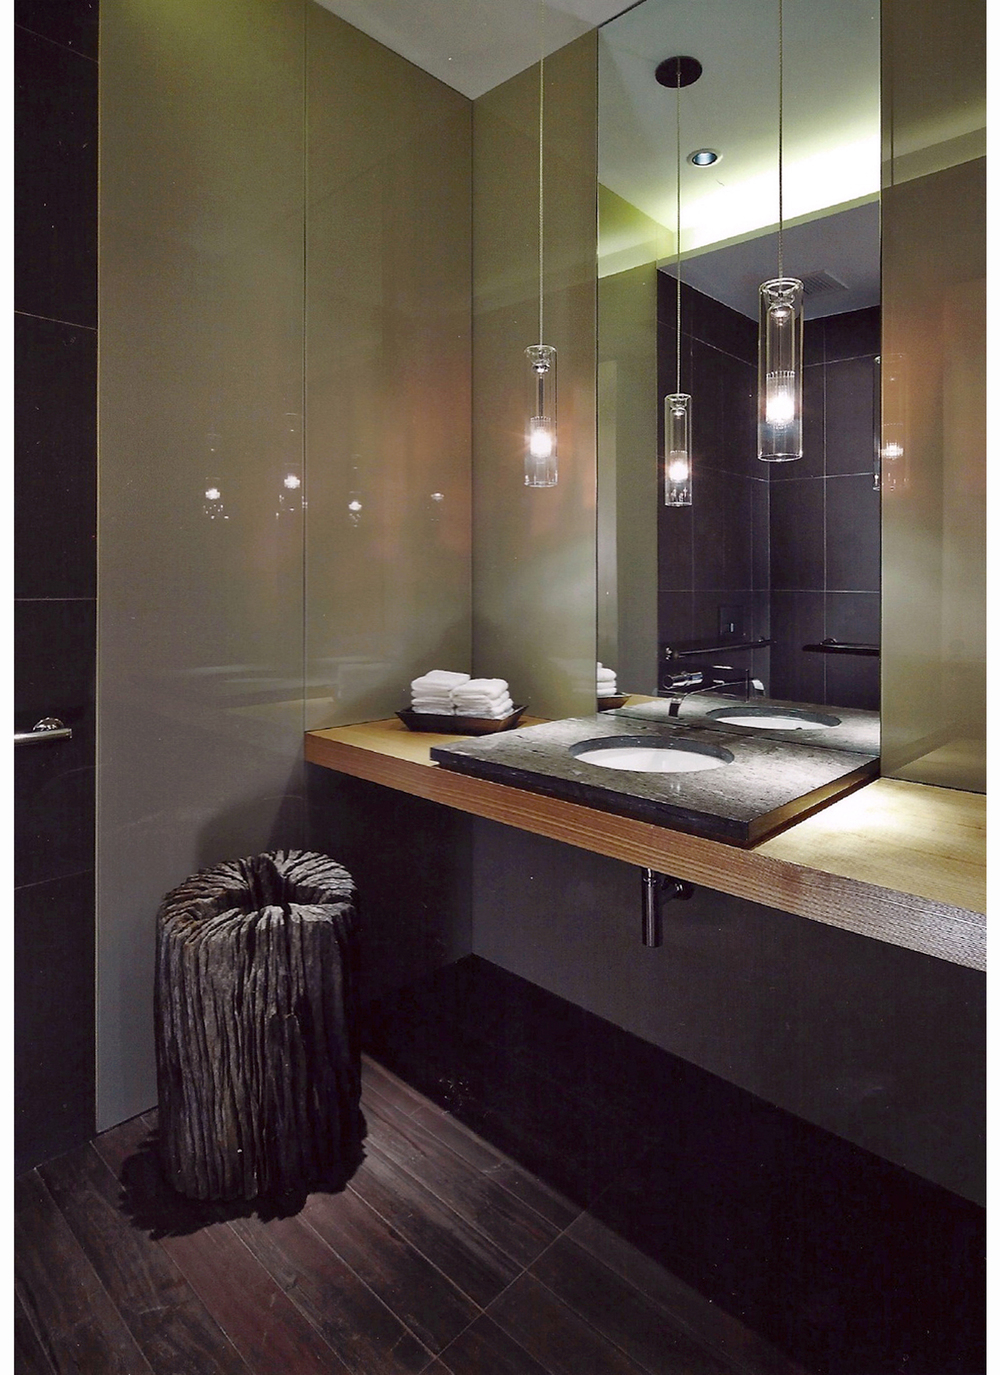 grace_11_bathroom_fall.jpg